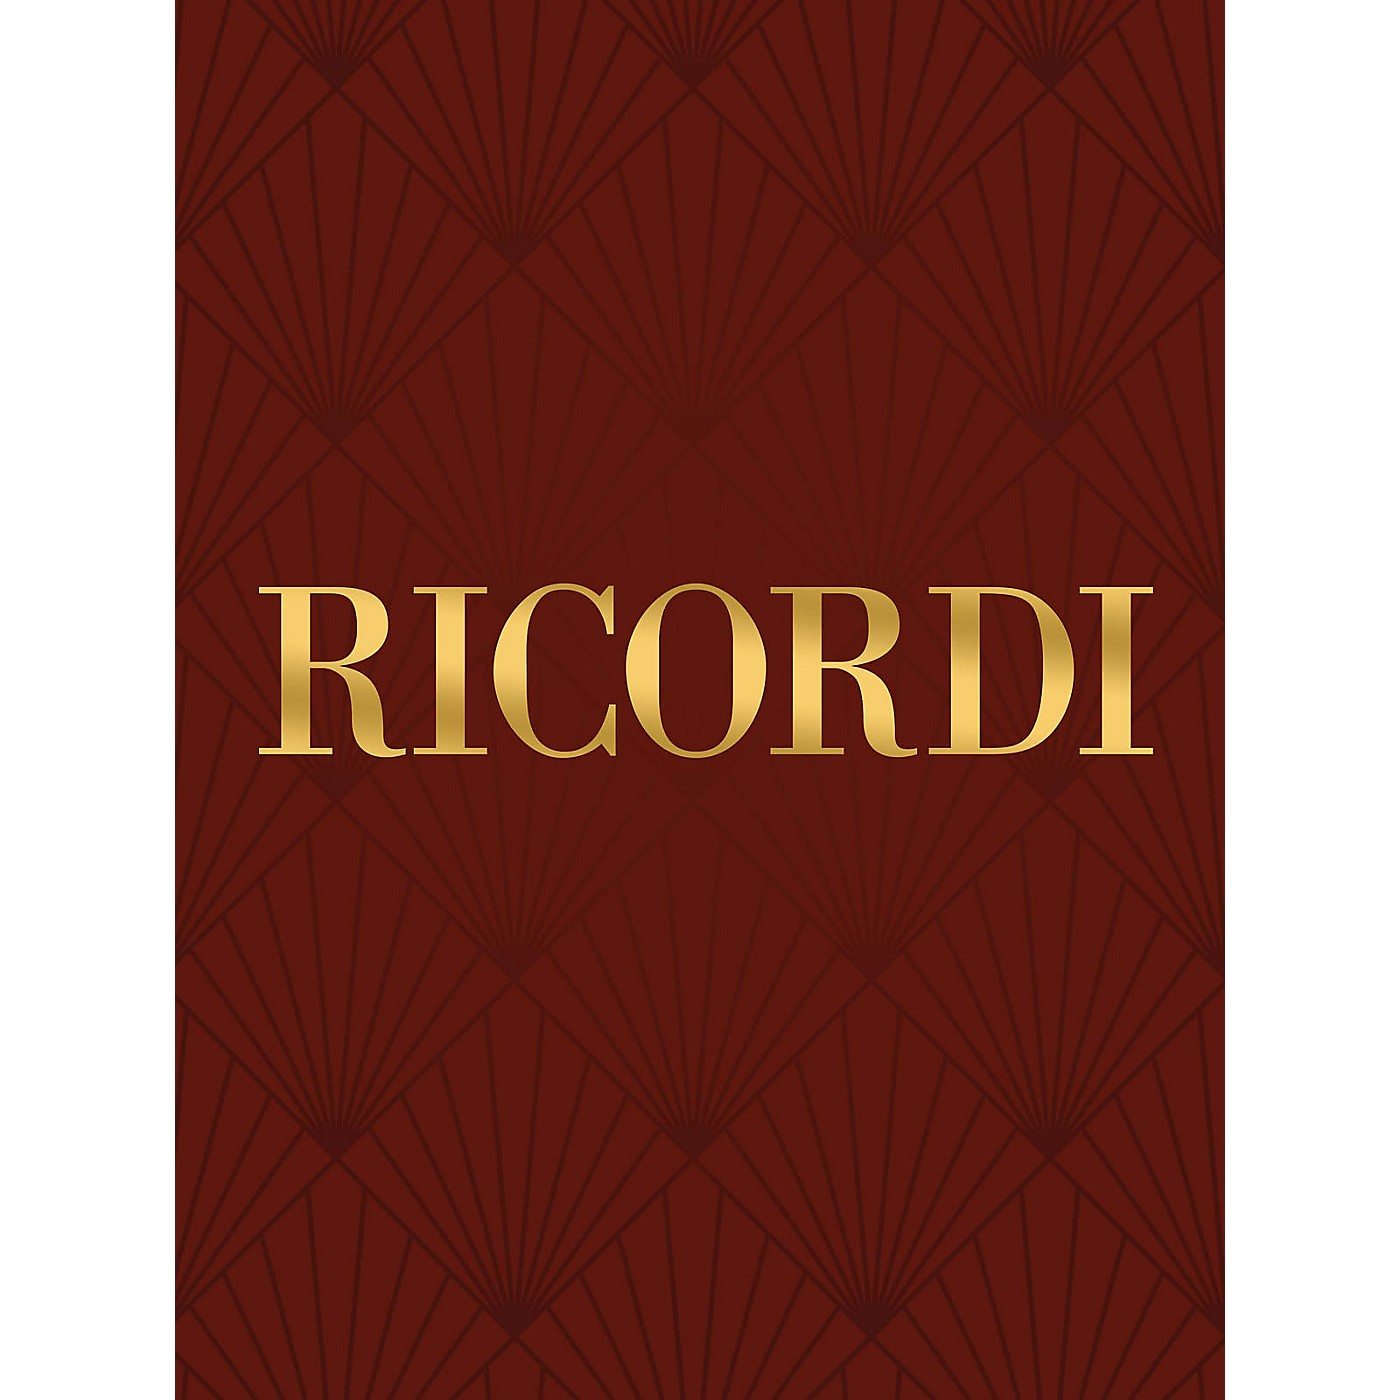 Ricordi 26 Exercises, Op. 107, Book 1 Woodwind Method Series by Anton Fürstenau Edited by Fabbrician thumbnail